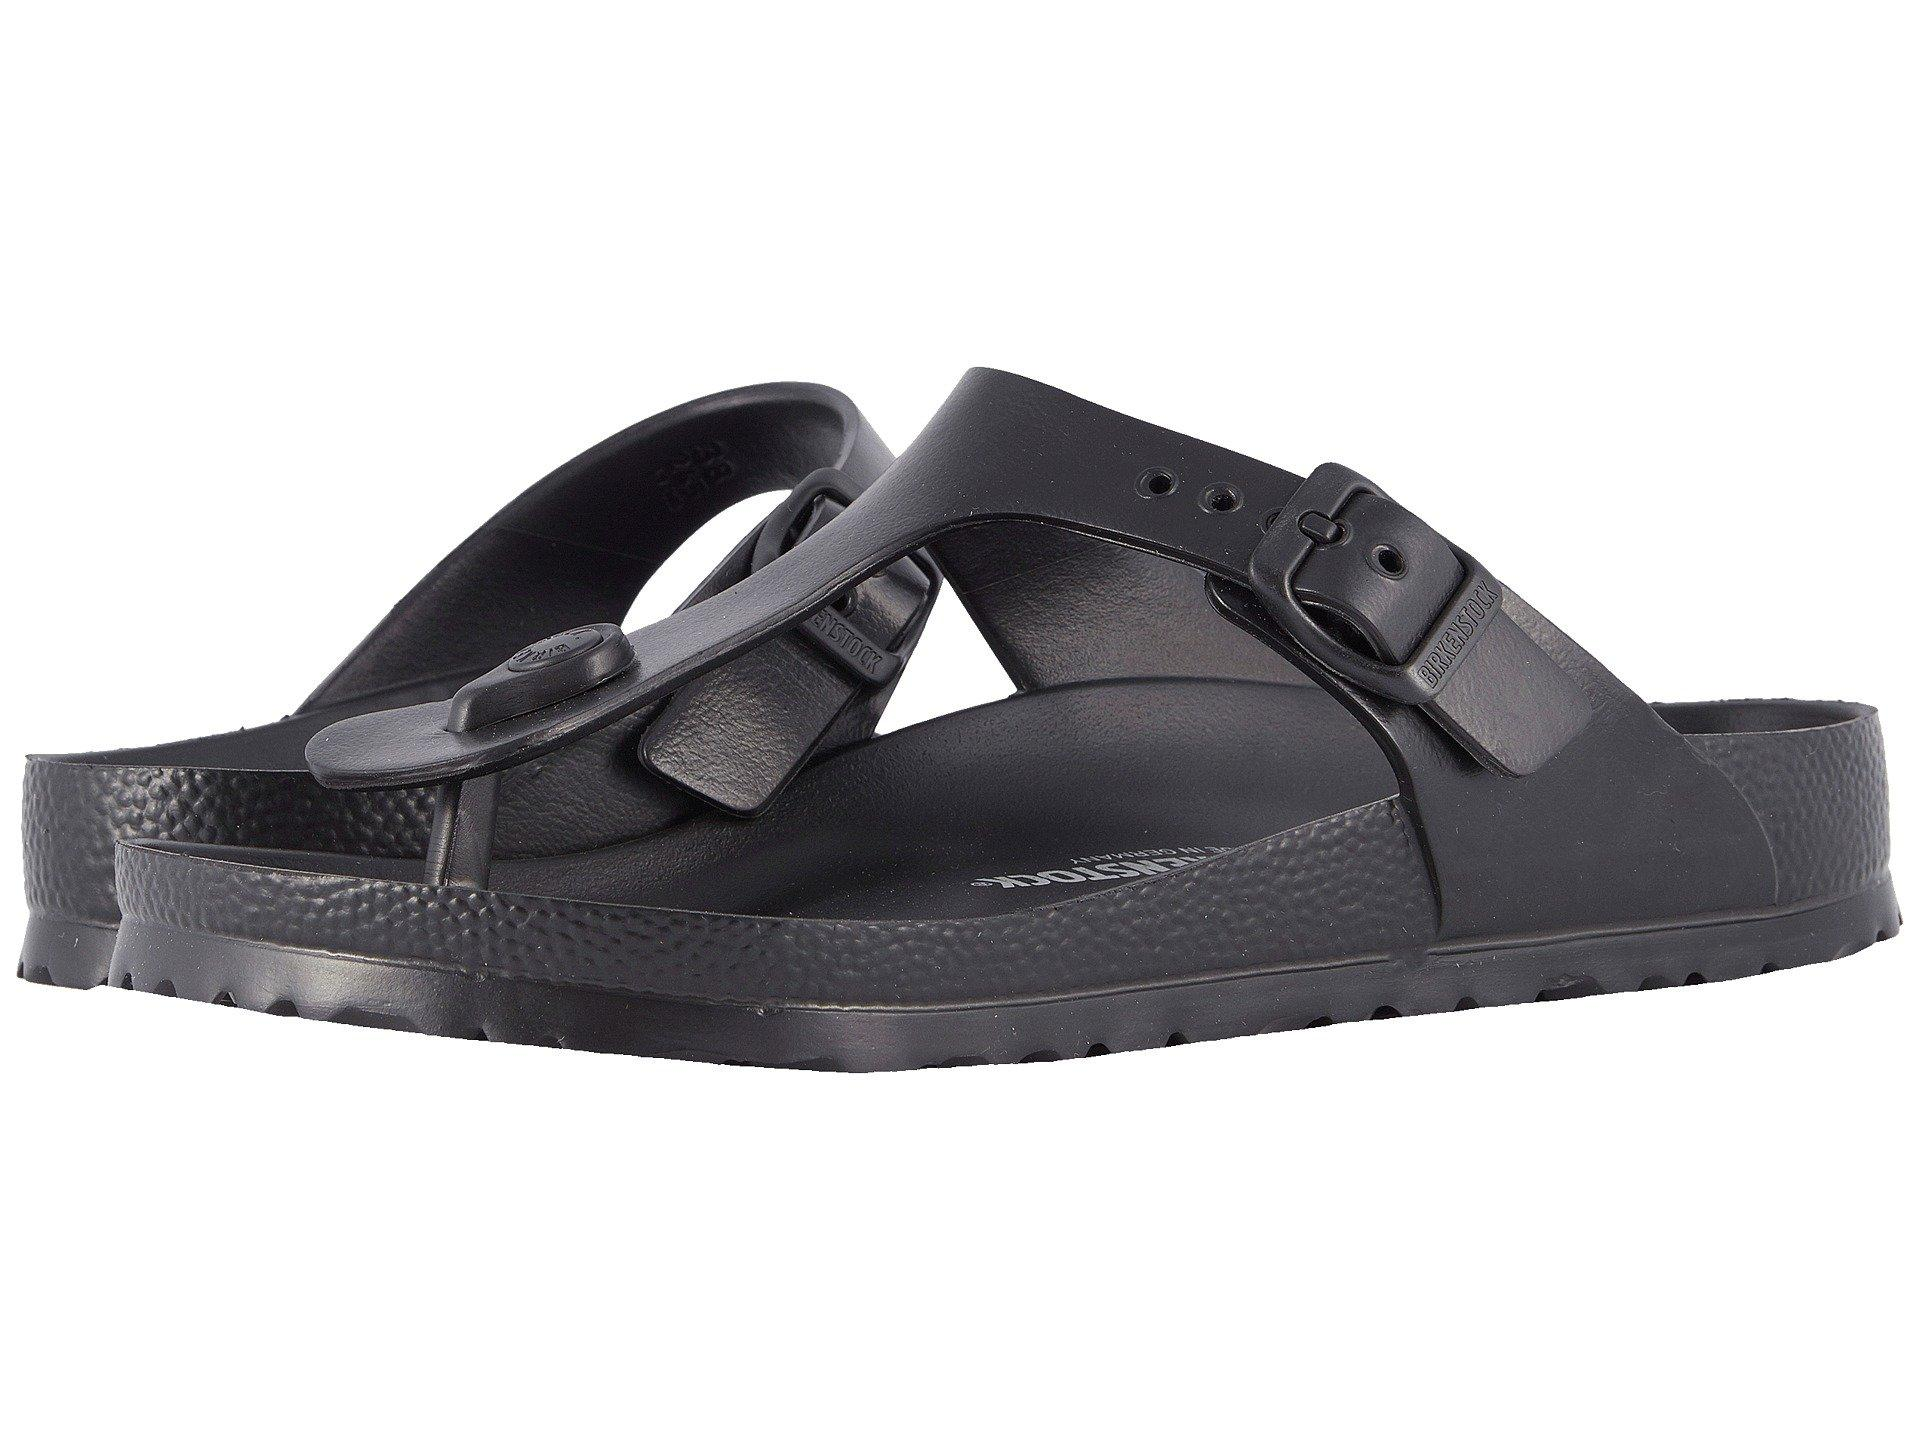 29ec1f431bfb Lyst - Birkenstock Gizeh Essentials (coral Eva) Women s Sandals in Black